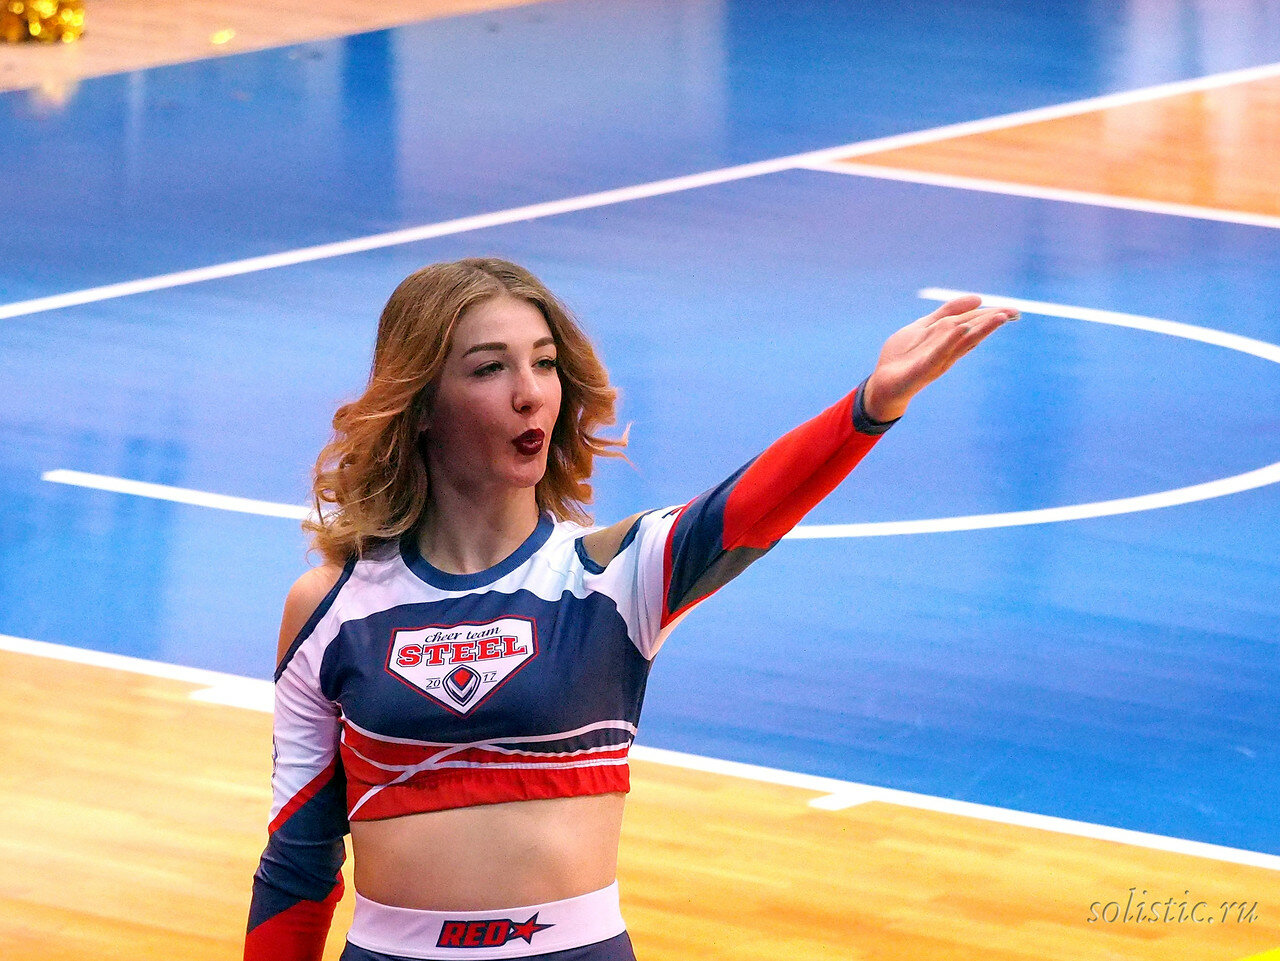 104 Матч звезд АСБ 2018 (ассоциации студенческого баскетбола)